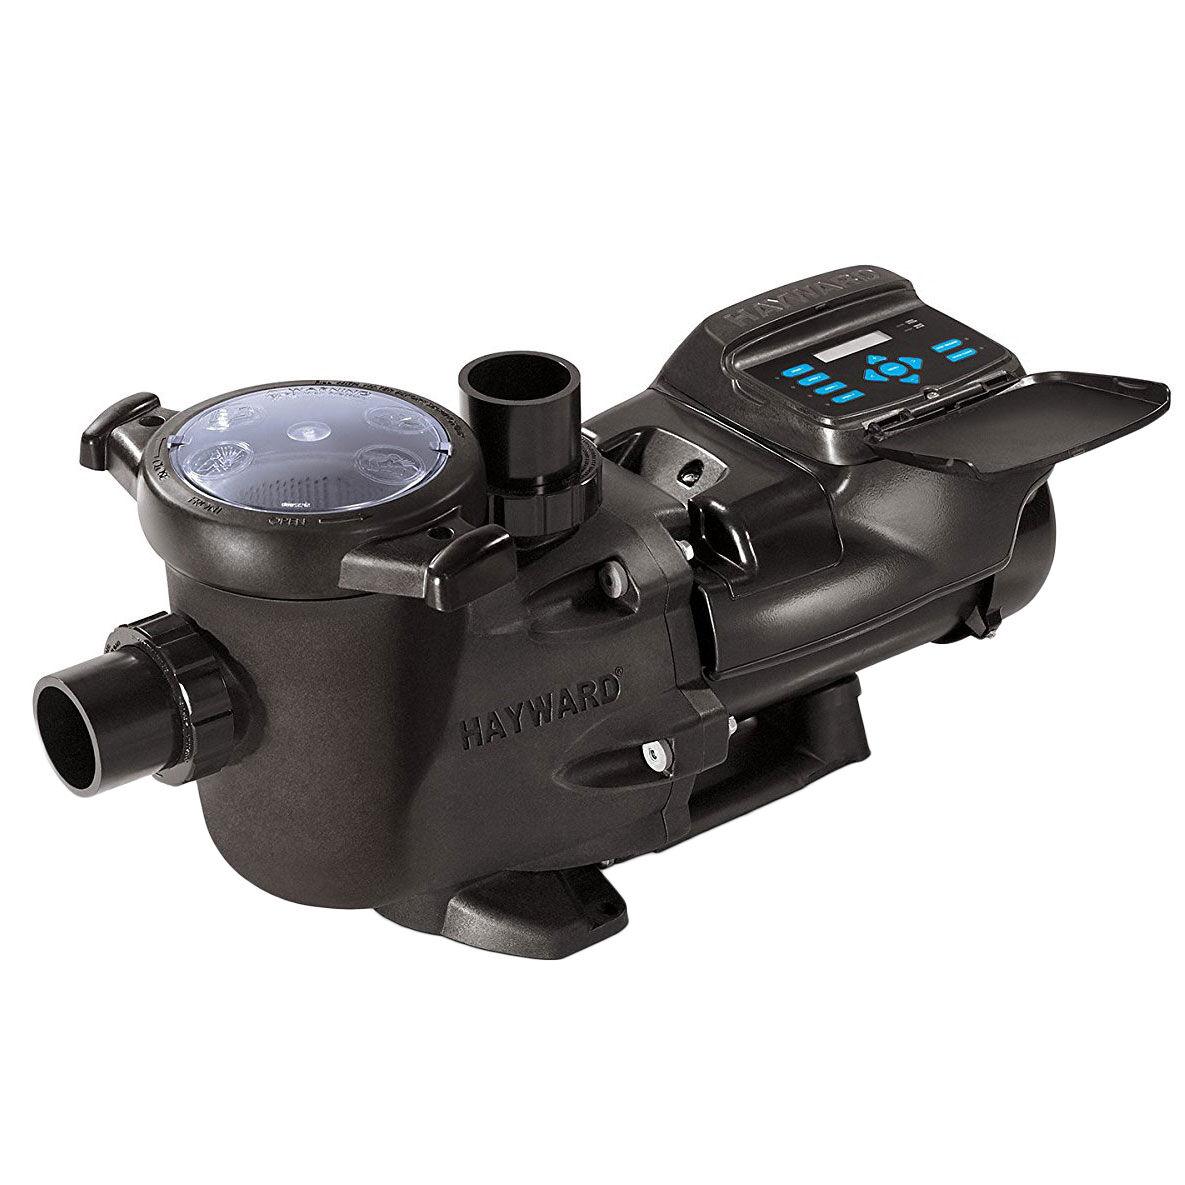 Hayward EcoStar Variable Speed TEFC Motor Inground Swimming Pool Pump SP3400VSP